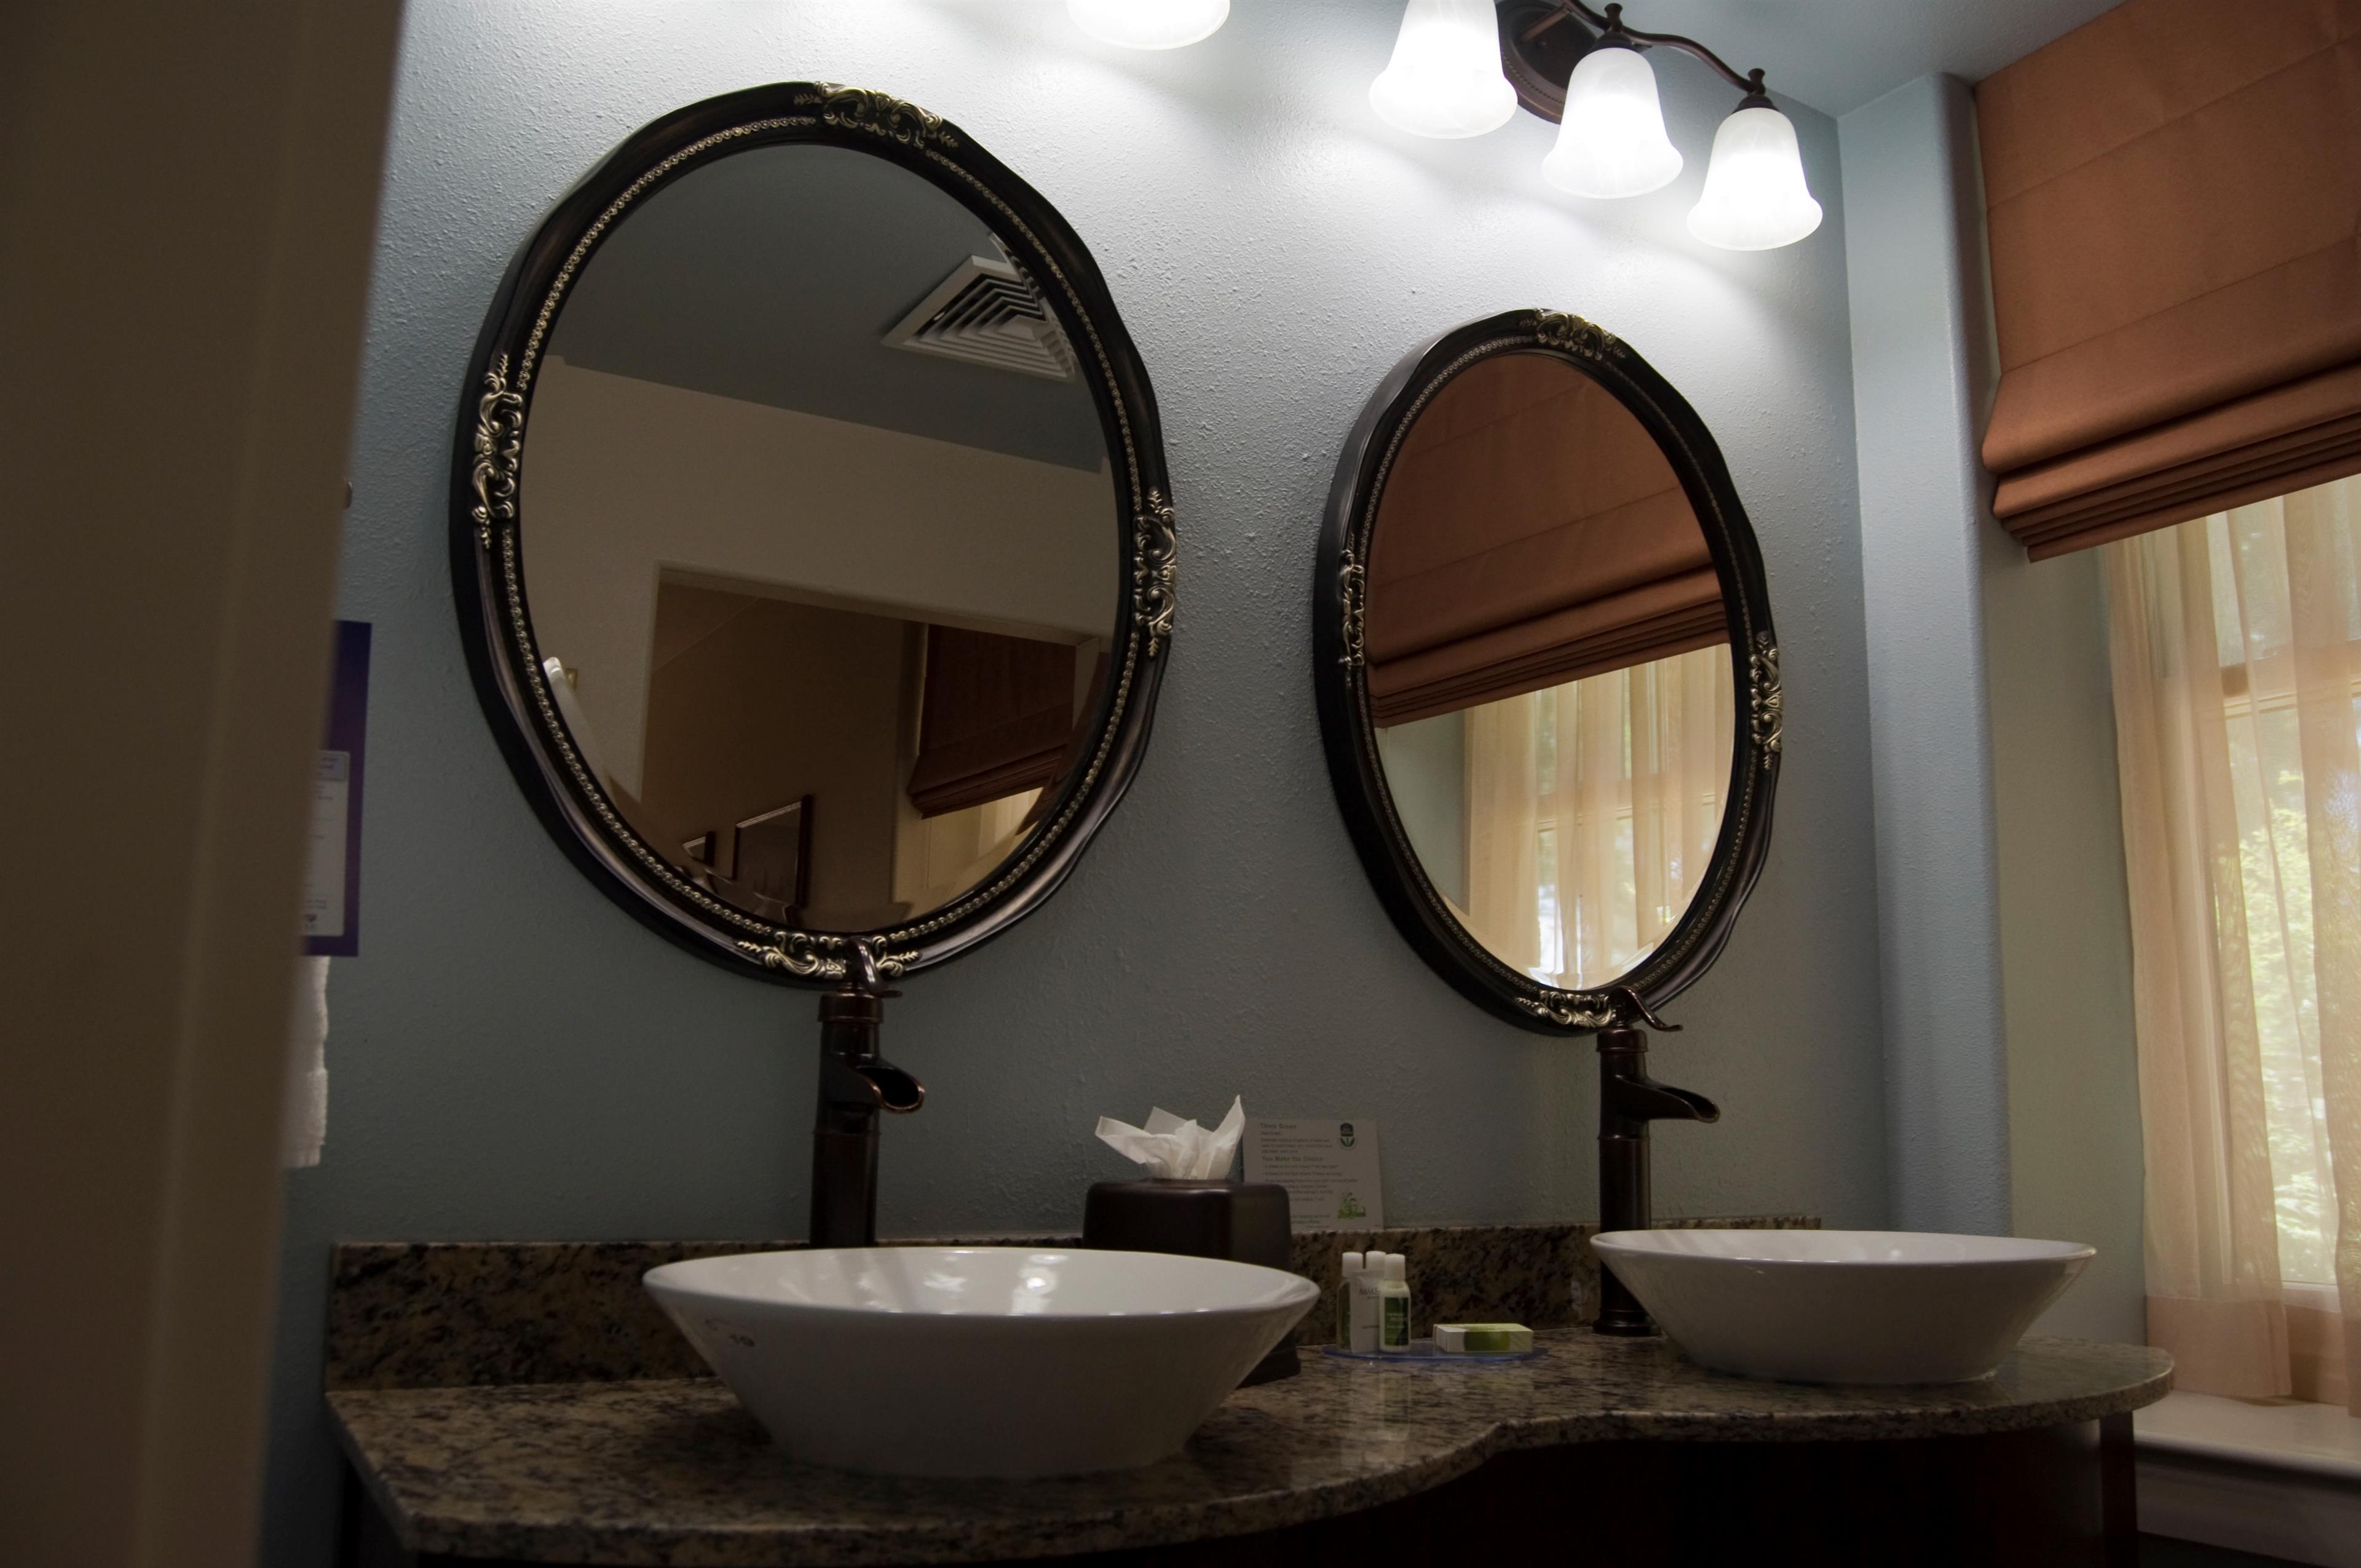 Best Western Plus Plaza Hotel image 41